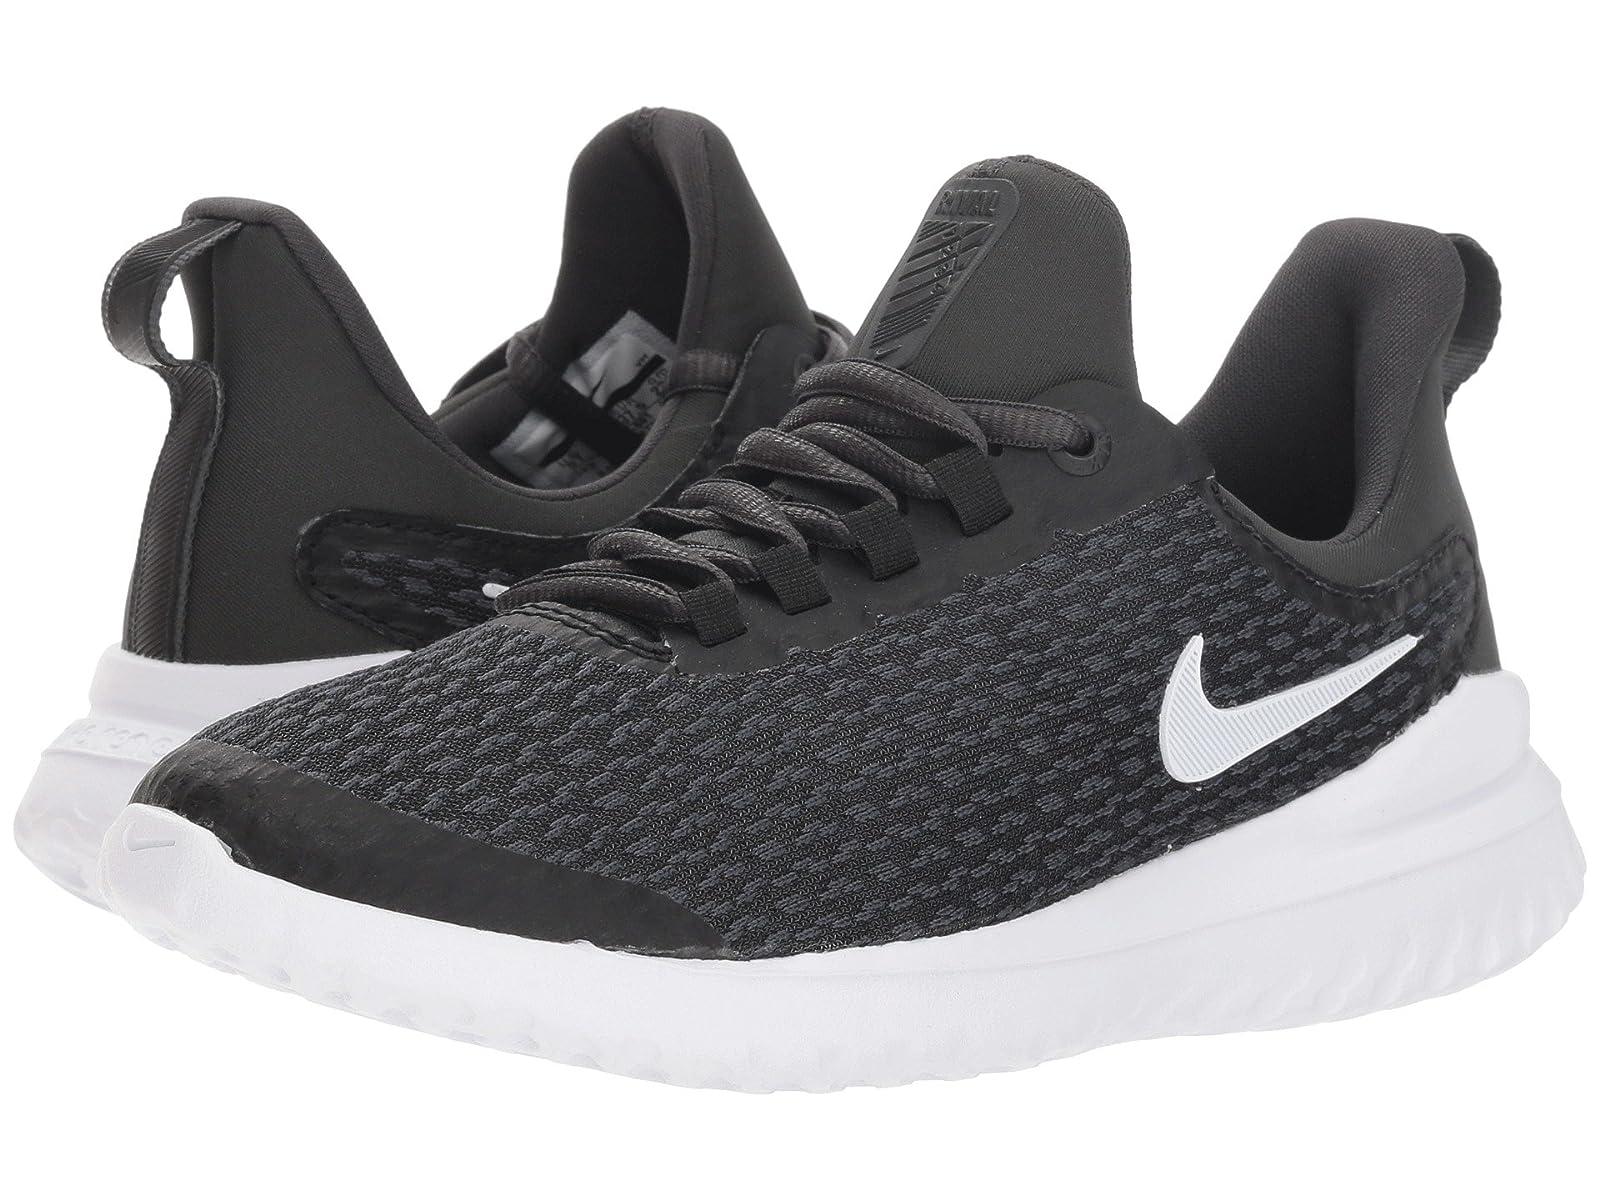 Nike Kids Renew Rival (Big Kid)Atmospheric grades have affordable shoes